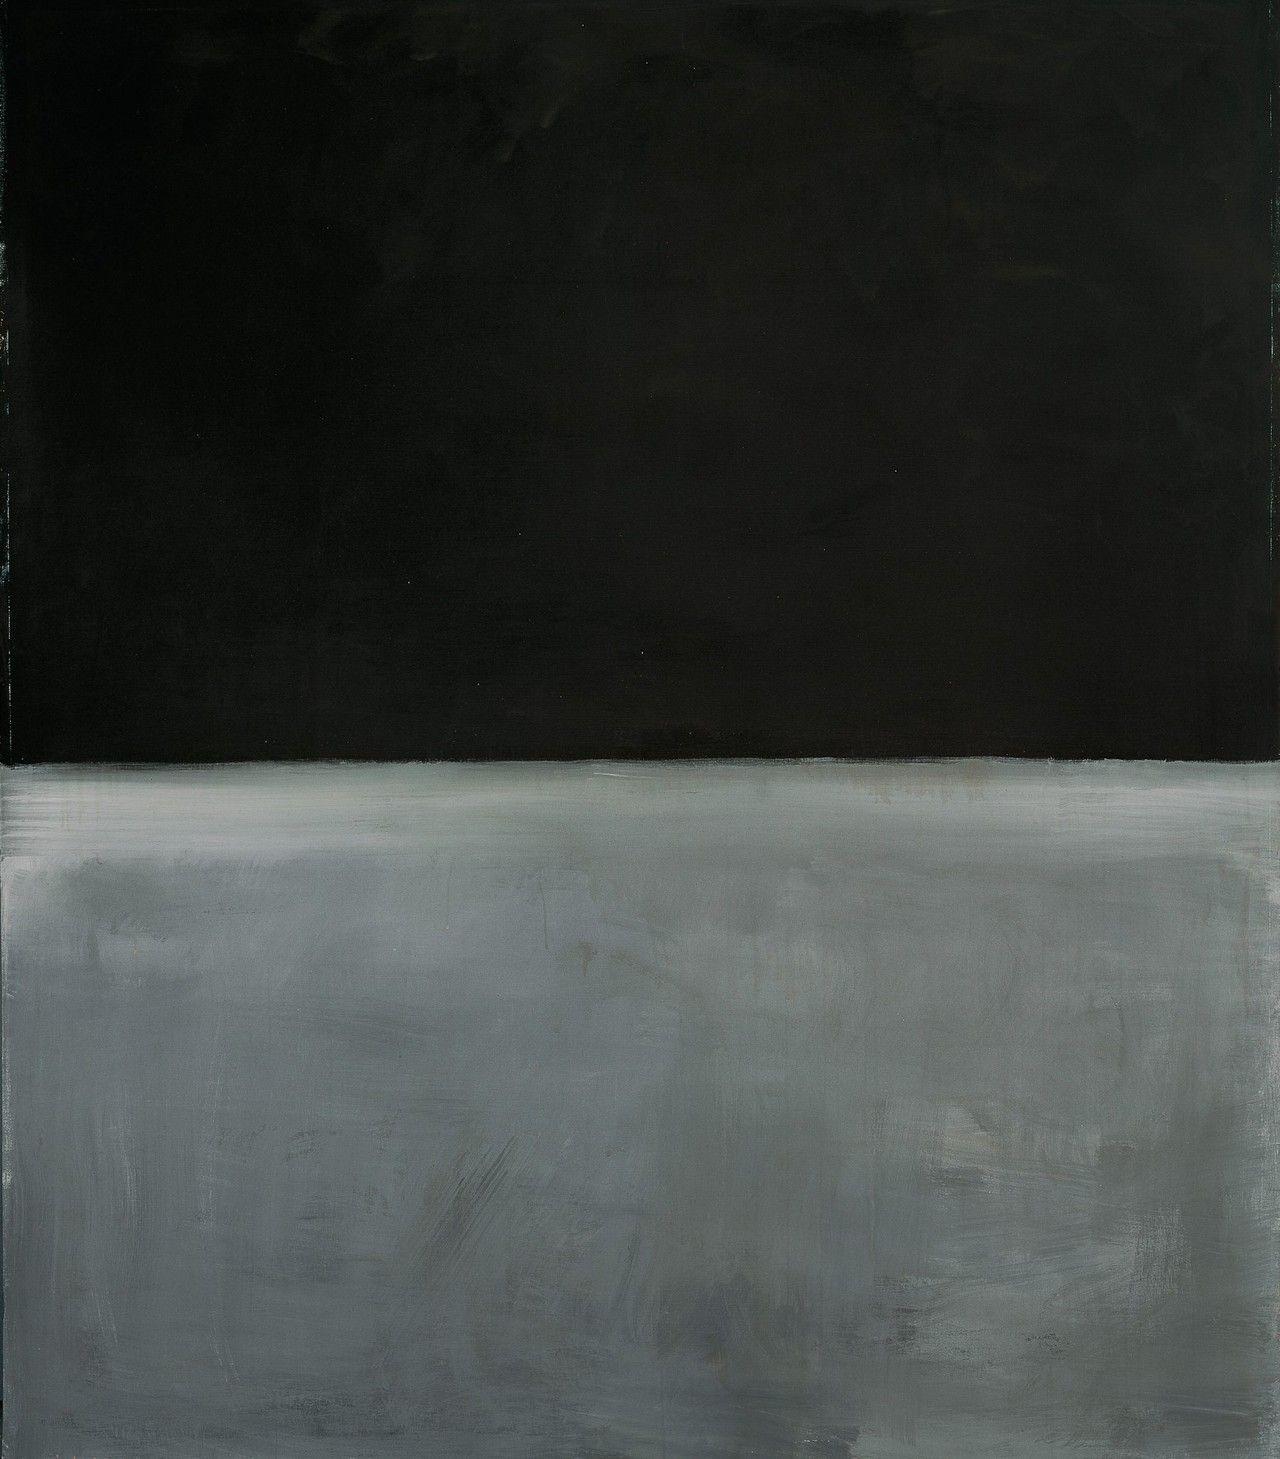 Mark Rothko, Untitled, 1969 Rothko's last work before committing suicide.